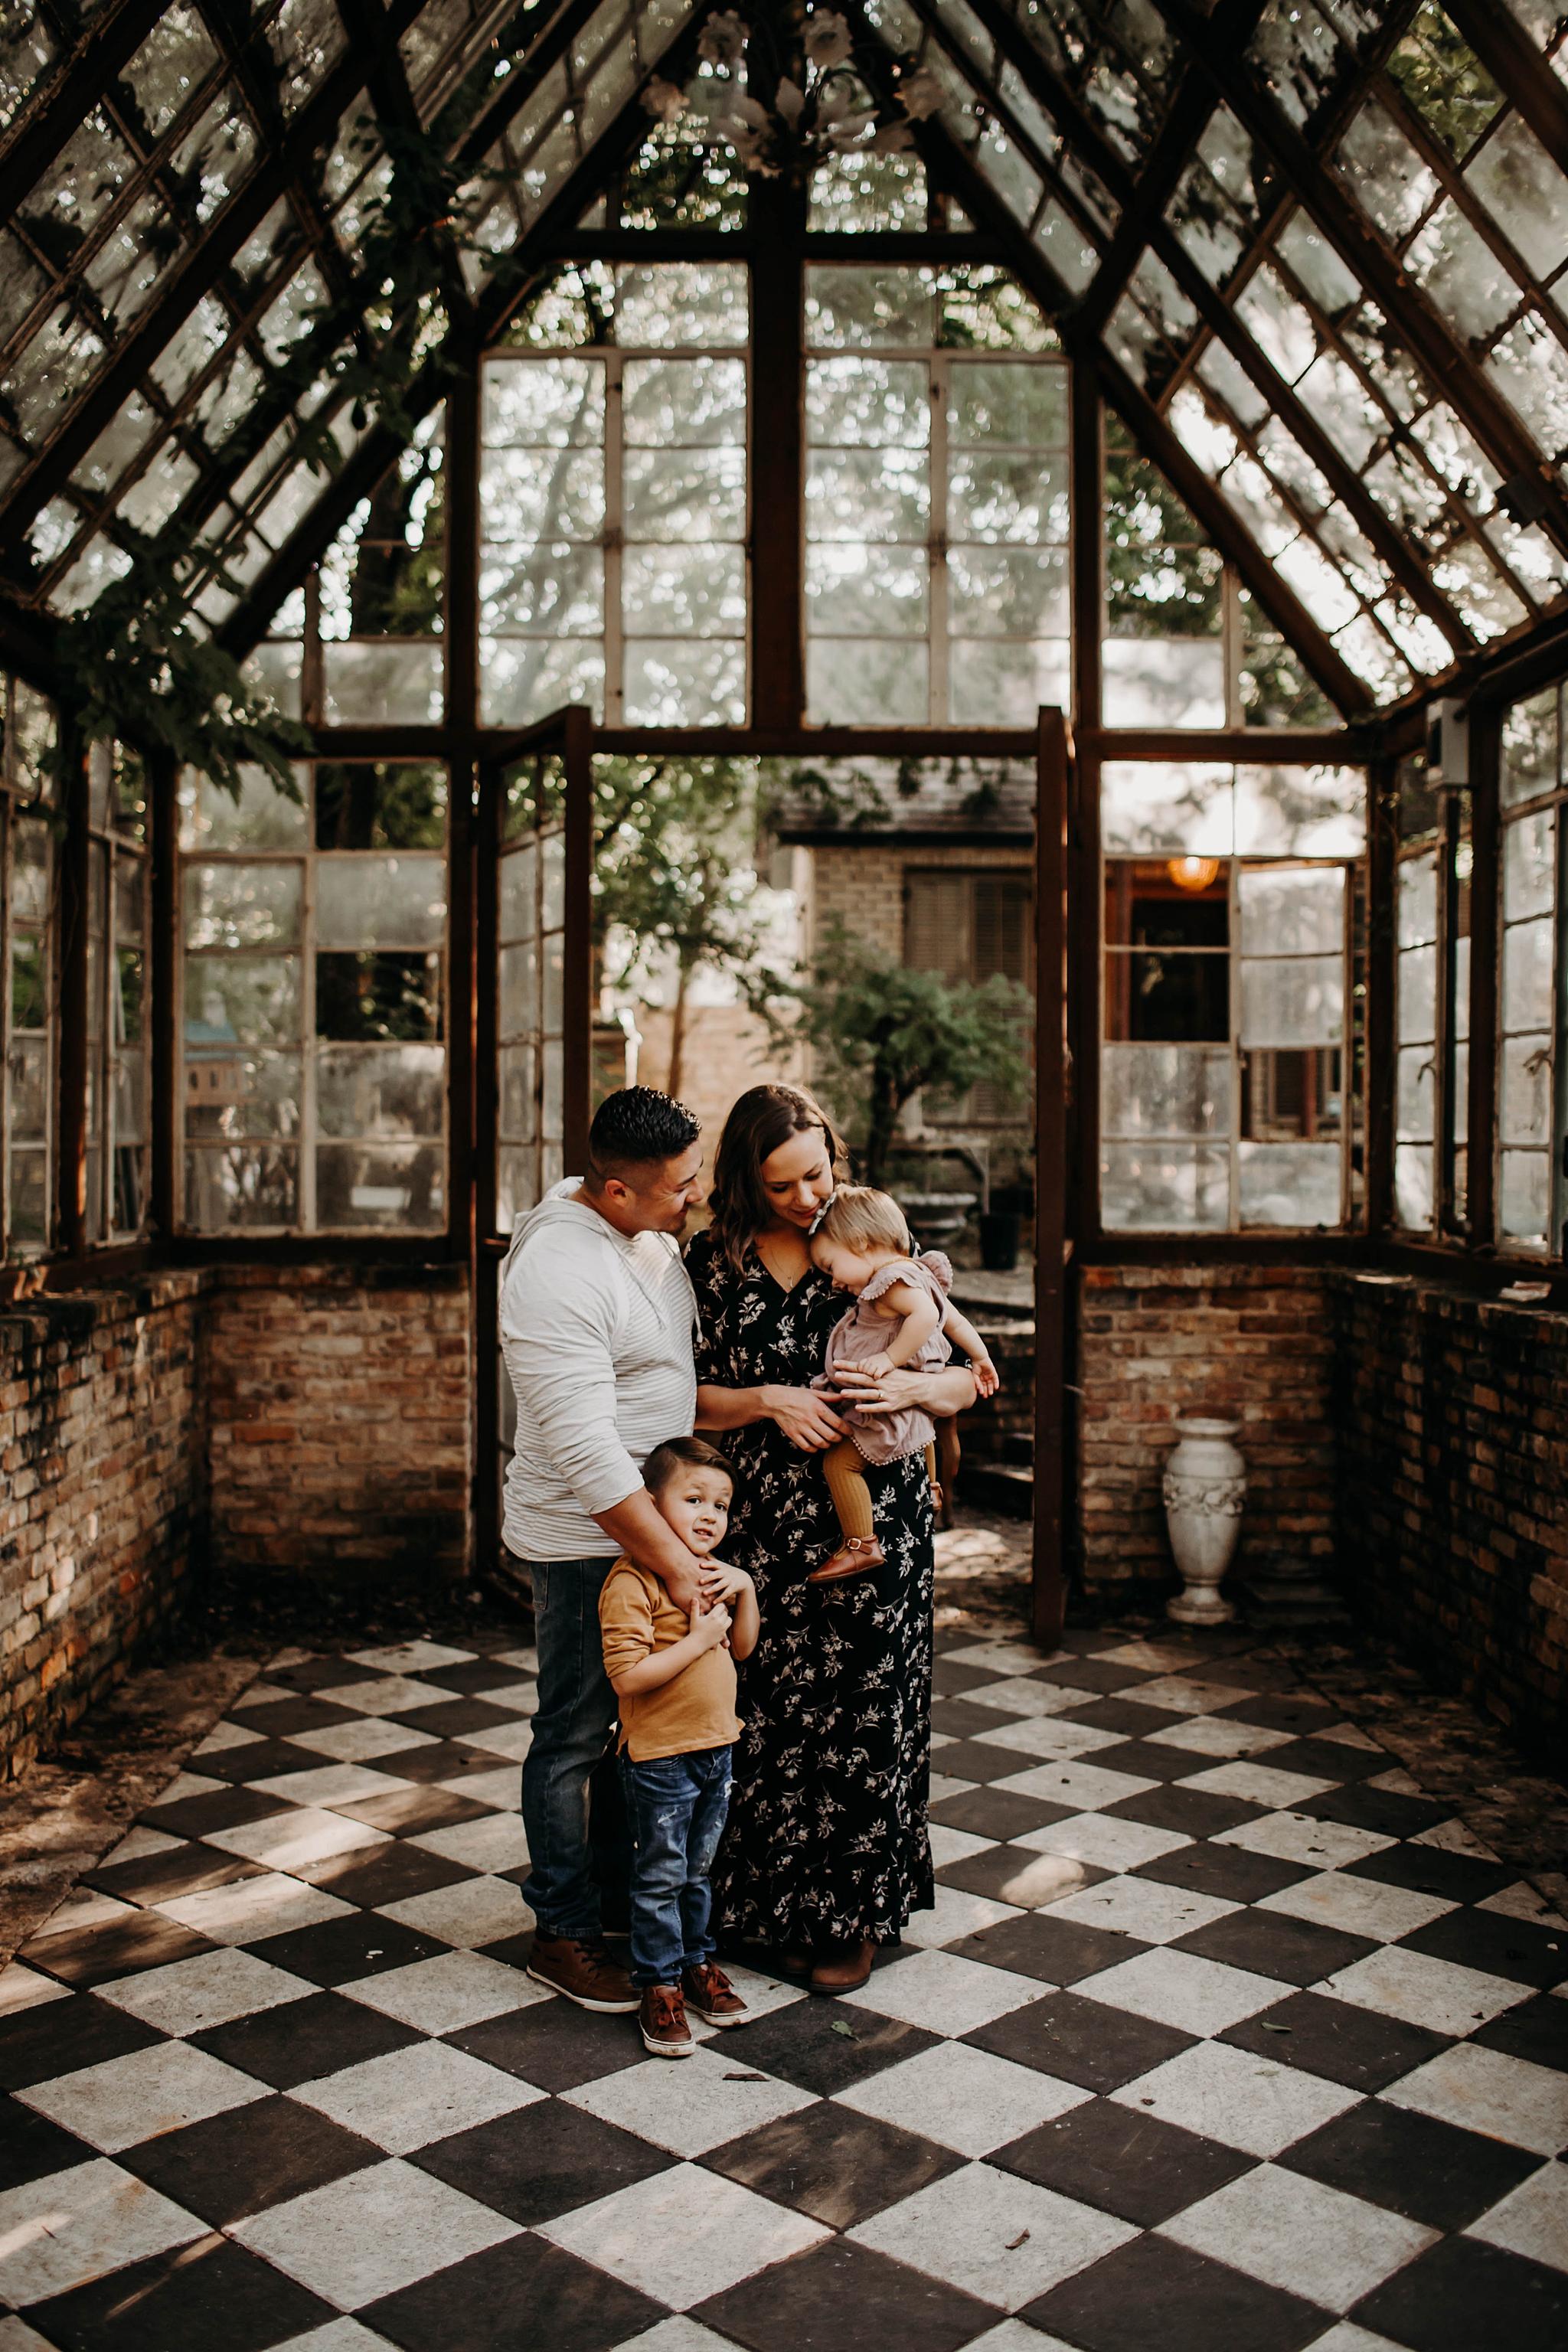 Luera-VMP-San-Antonio-Family-Photography-64_WEB.jpg